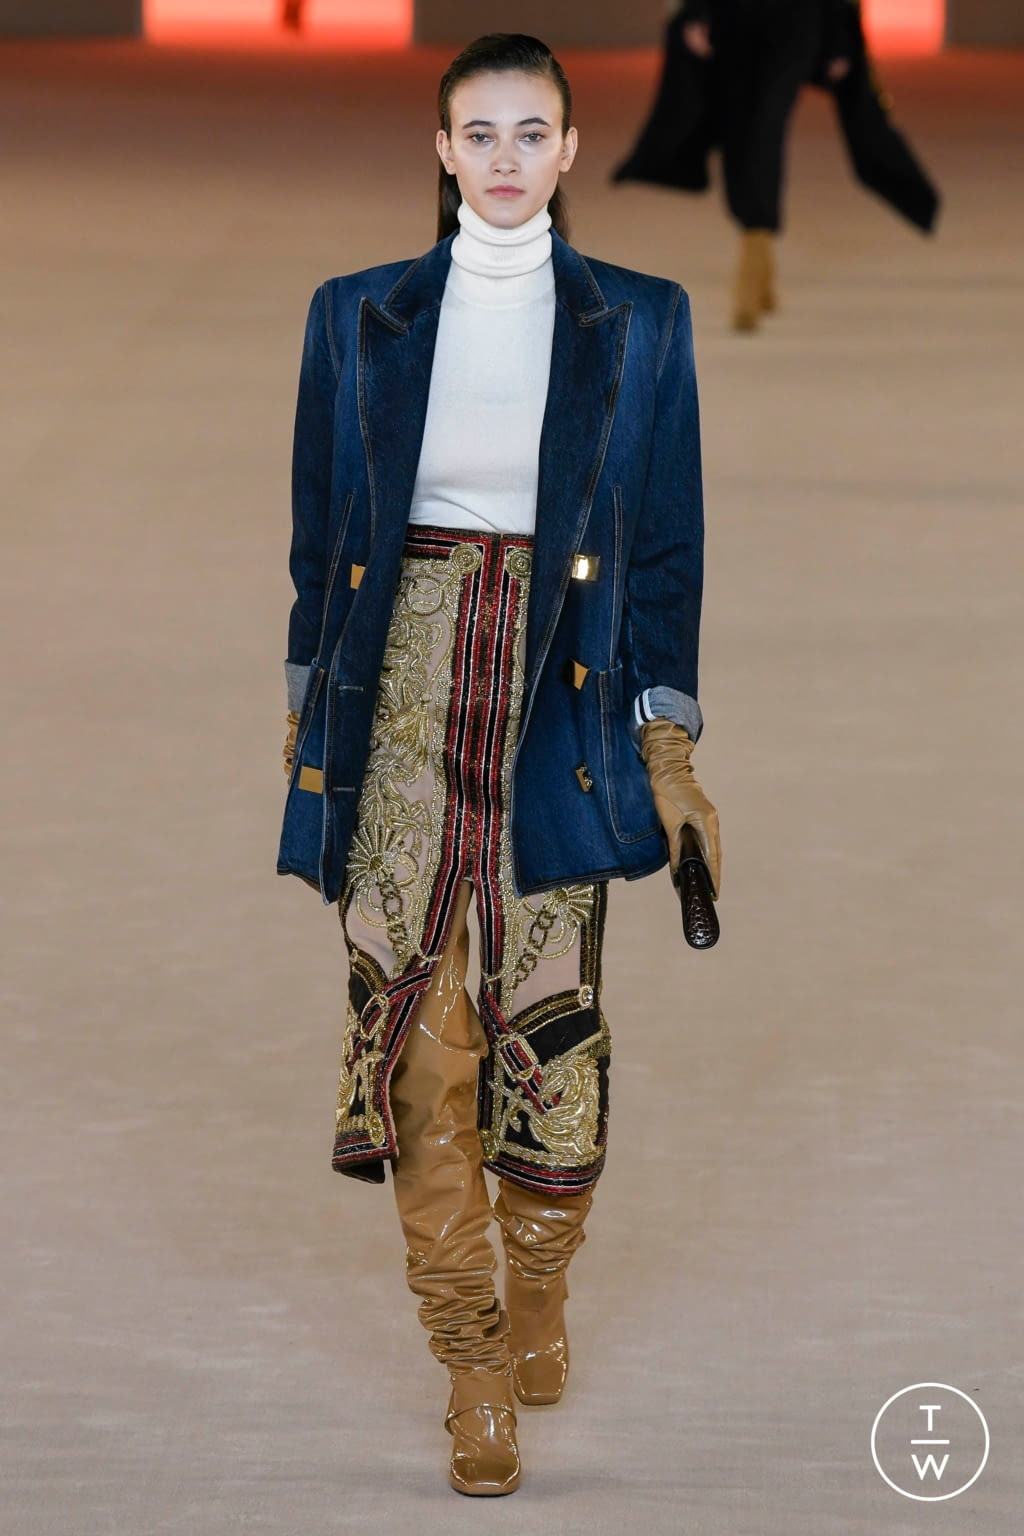 Fashion Week Paris Fall/Winter 2020 look 38 de la collection Balmain womenswear